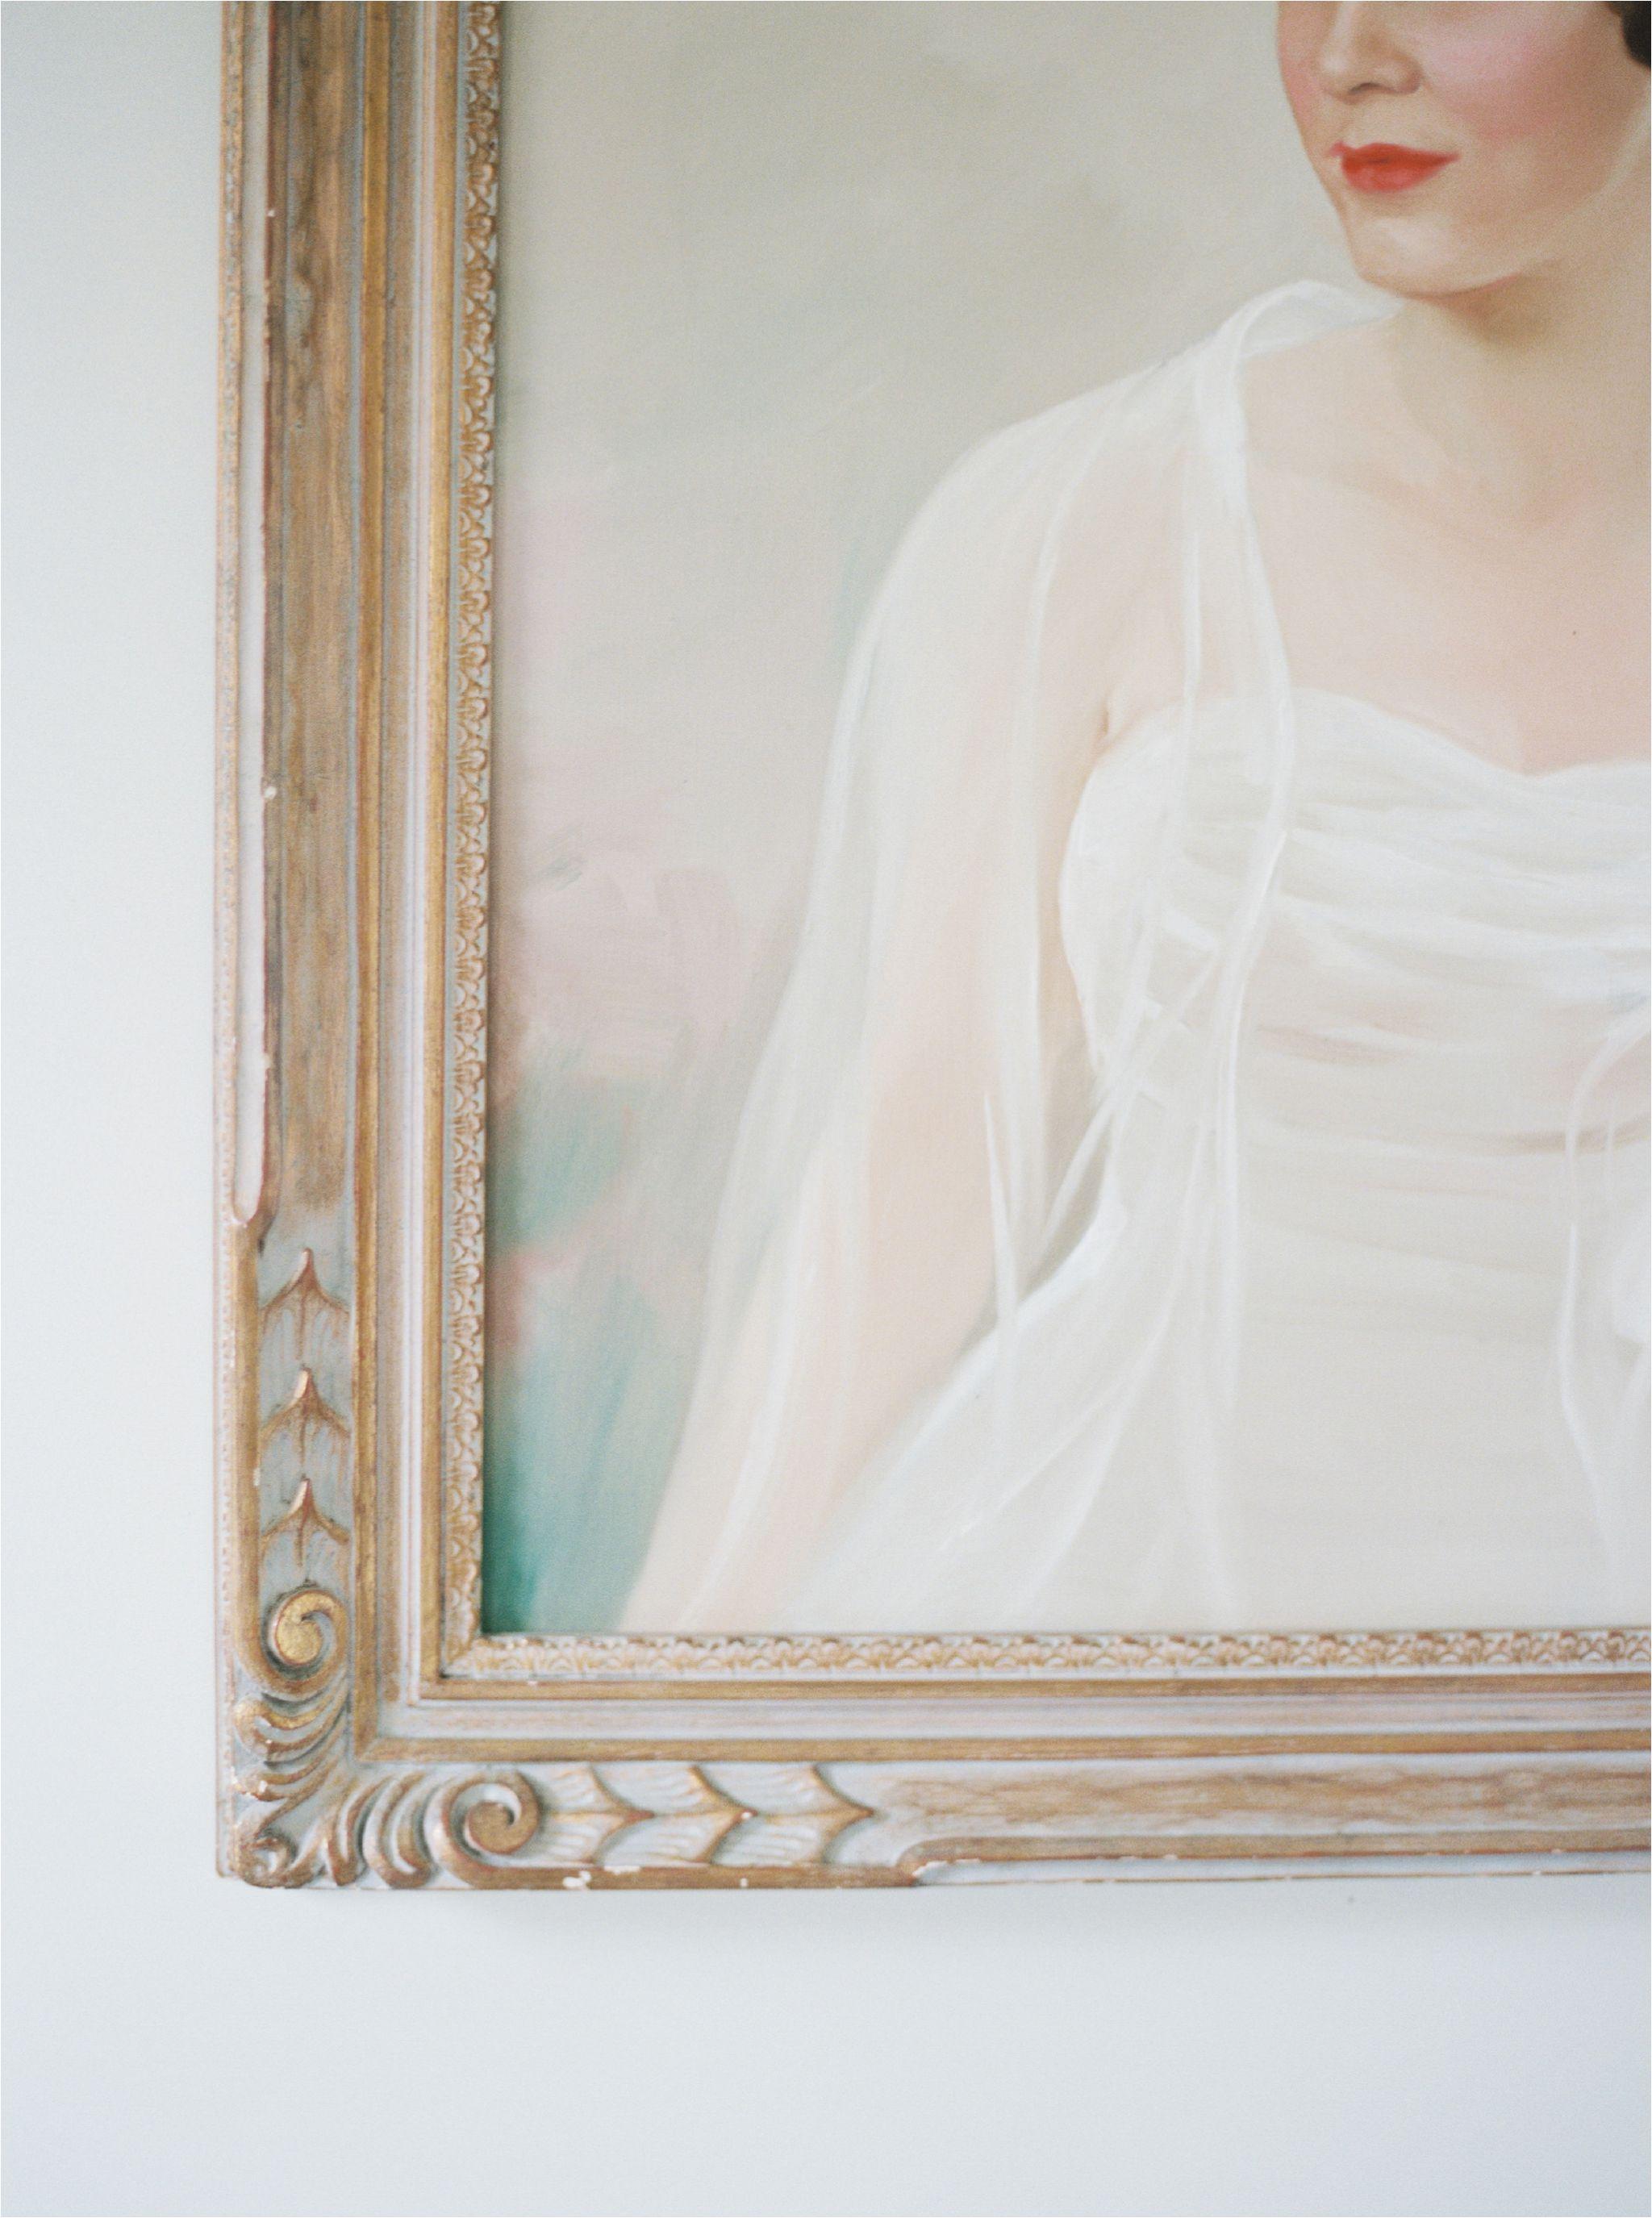 california_coast_mendicino_cuffeyscoveranch_wedding_elopement_photography00025.jpg